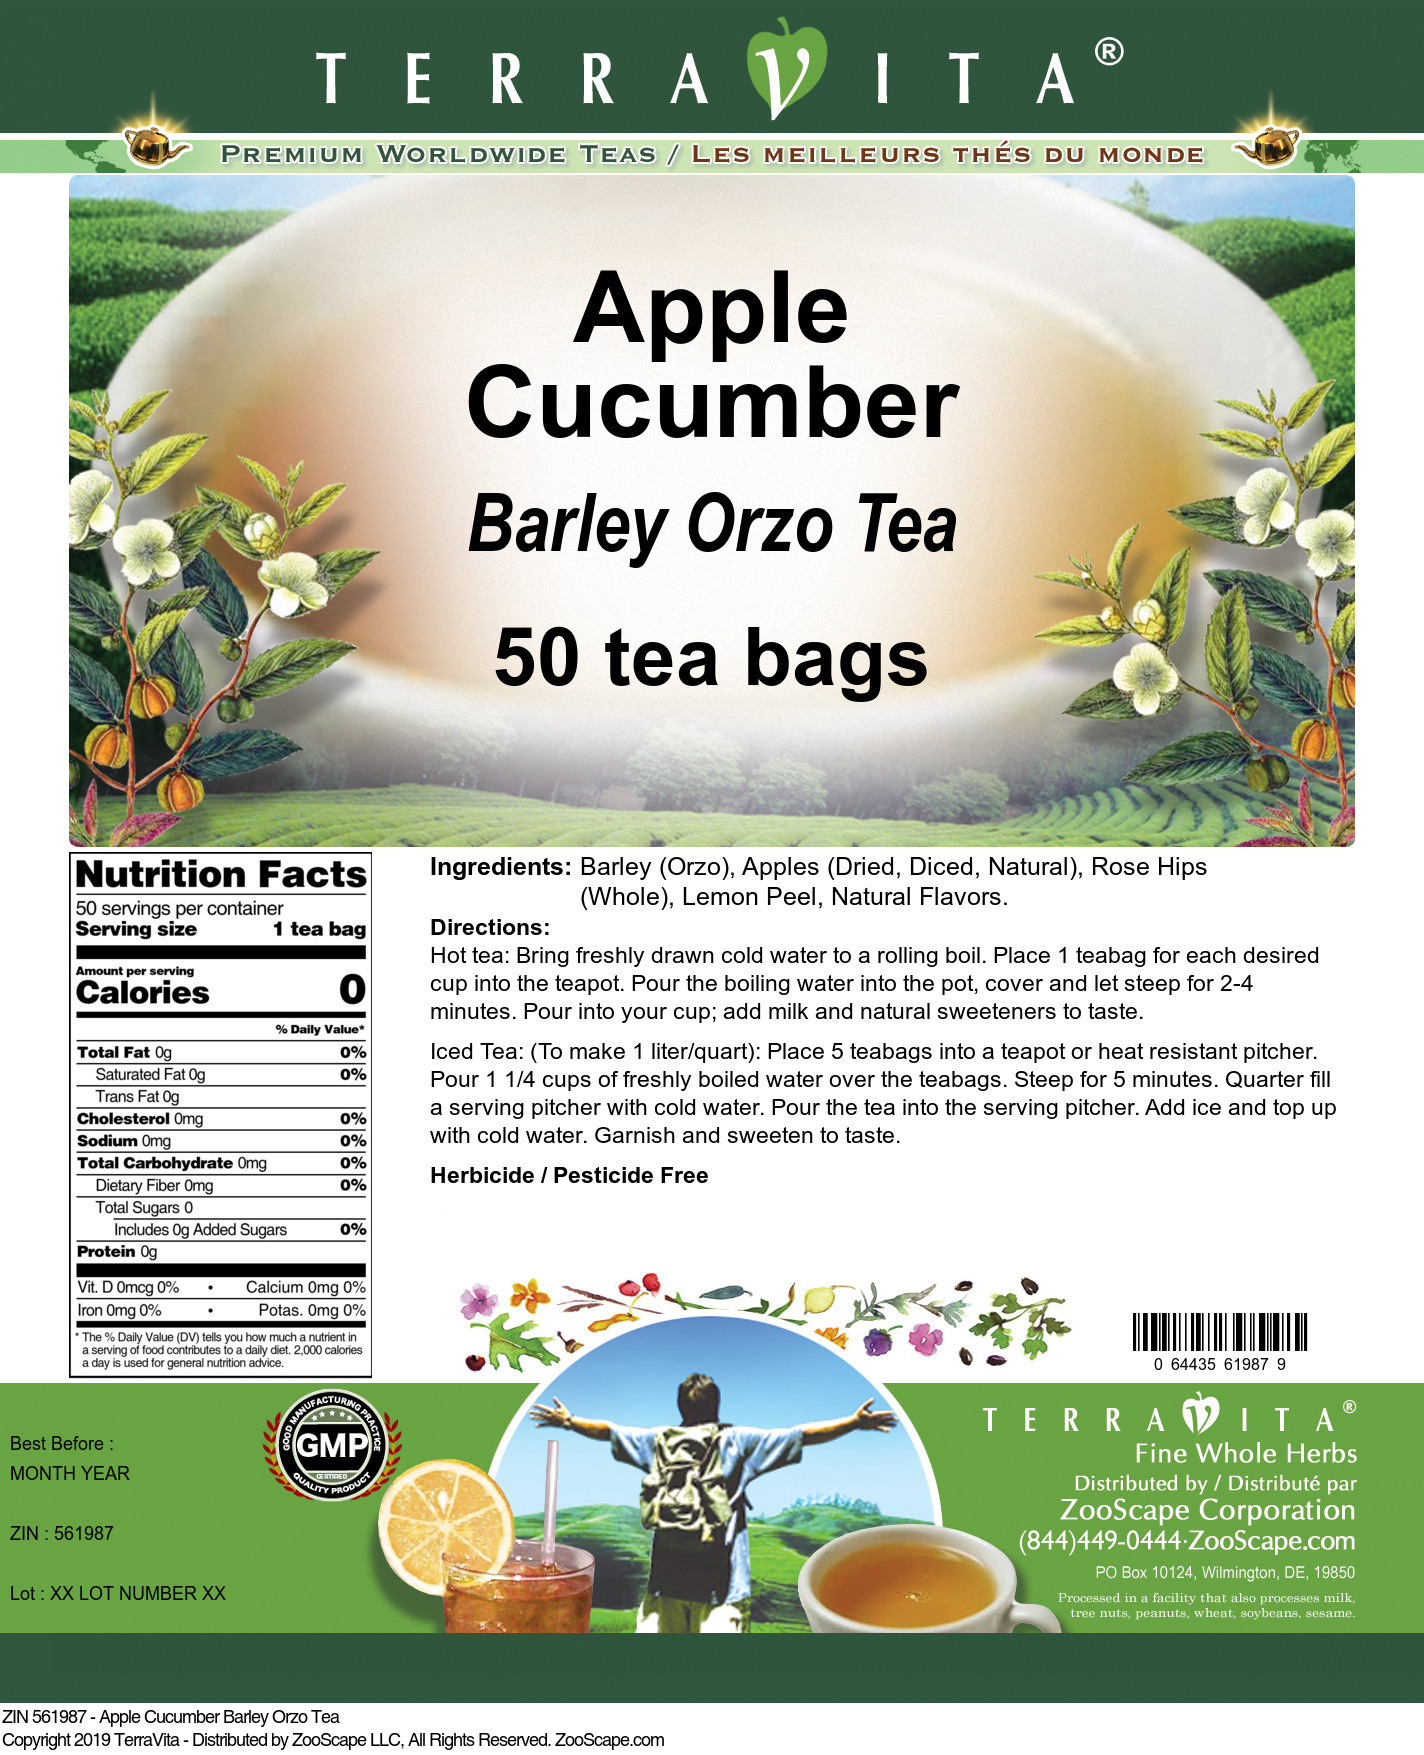 Apple Cucumber Barley Orzo Tea